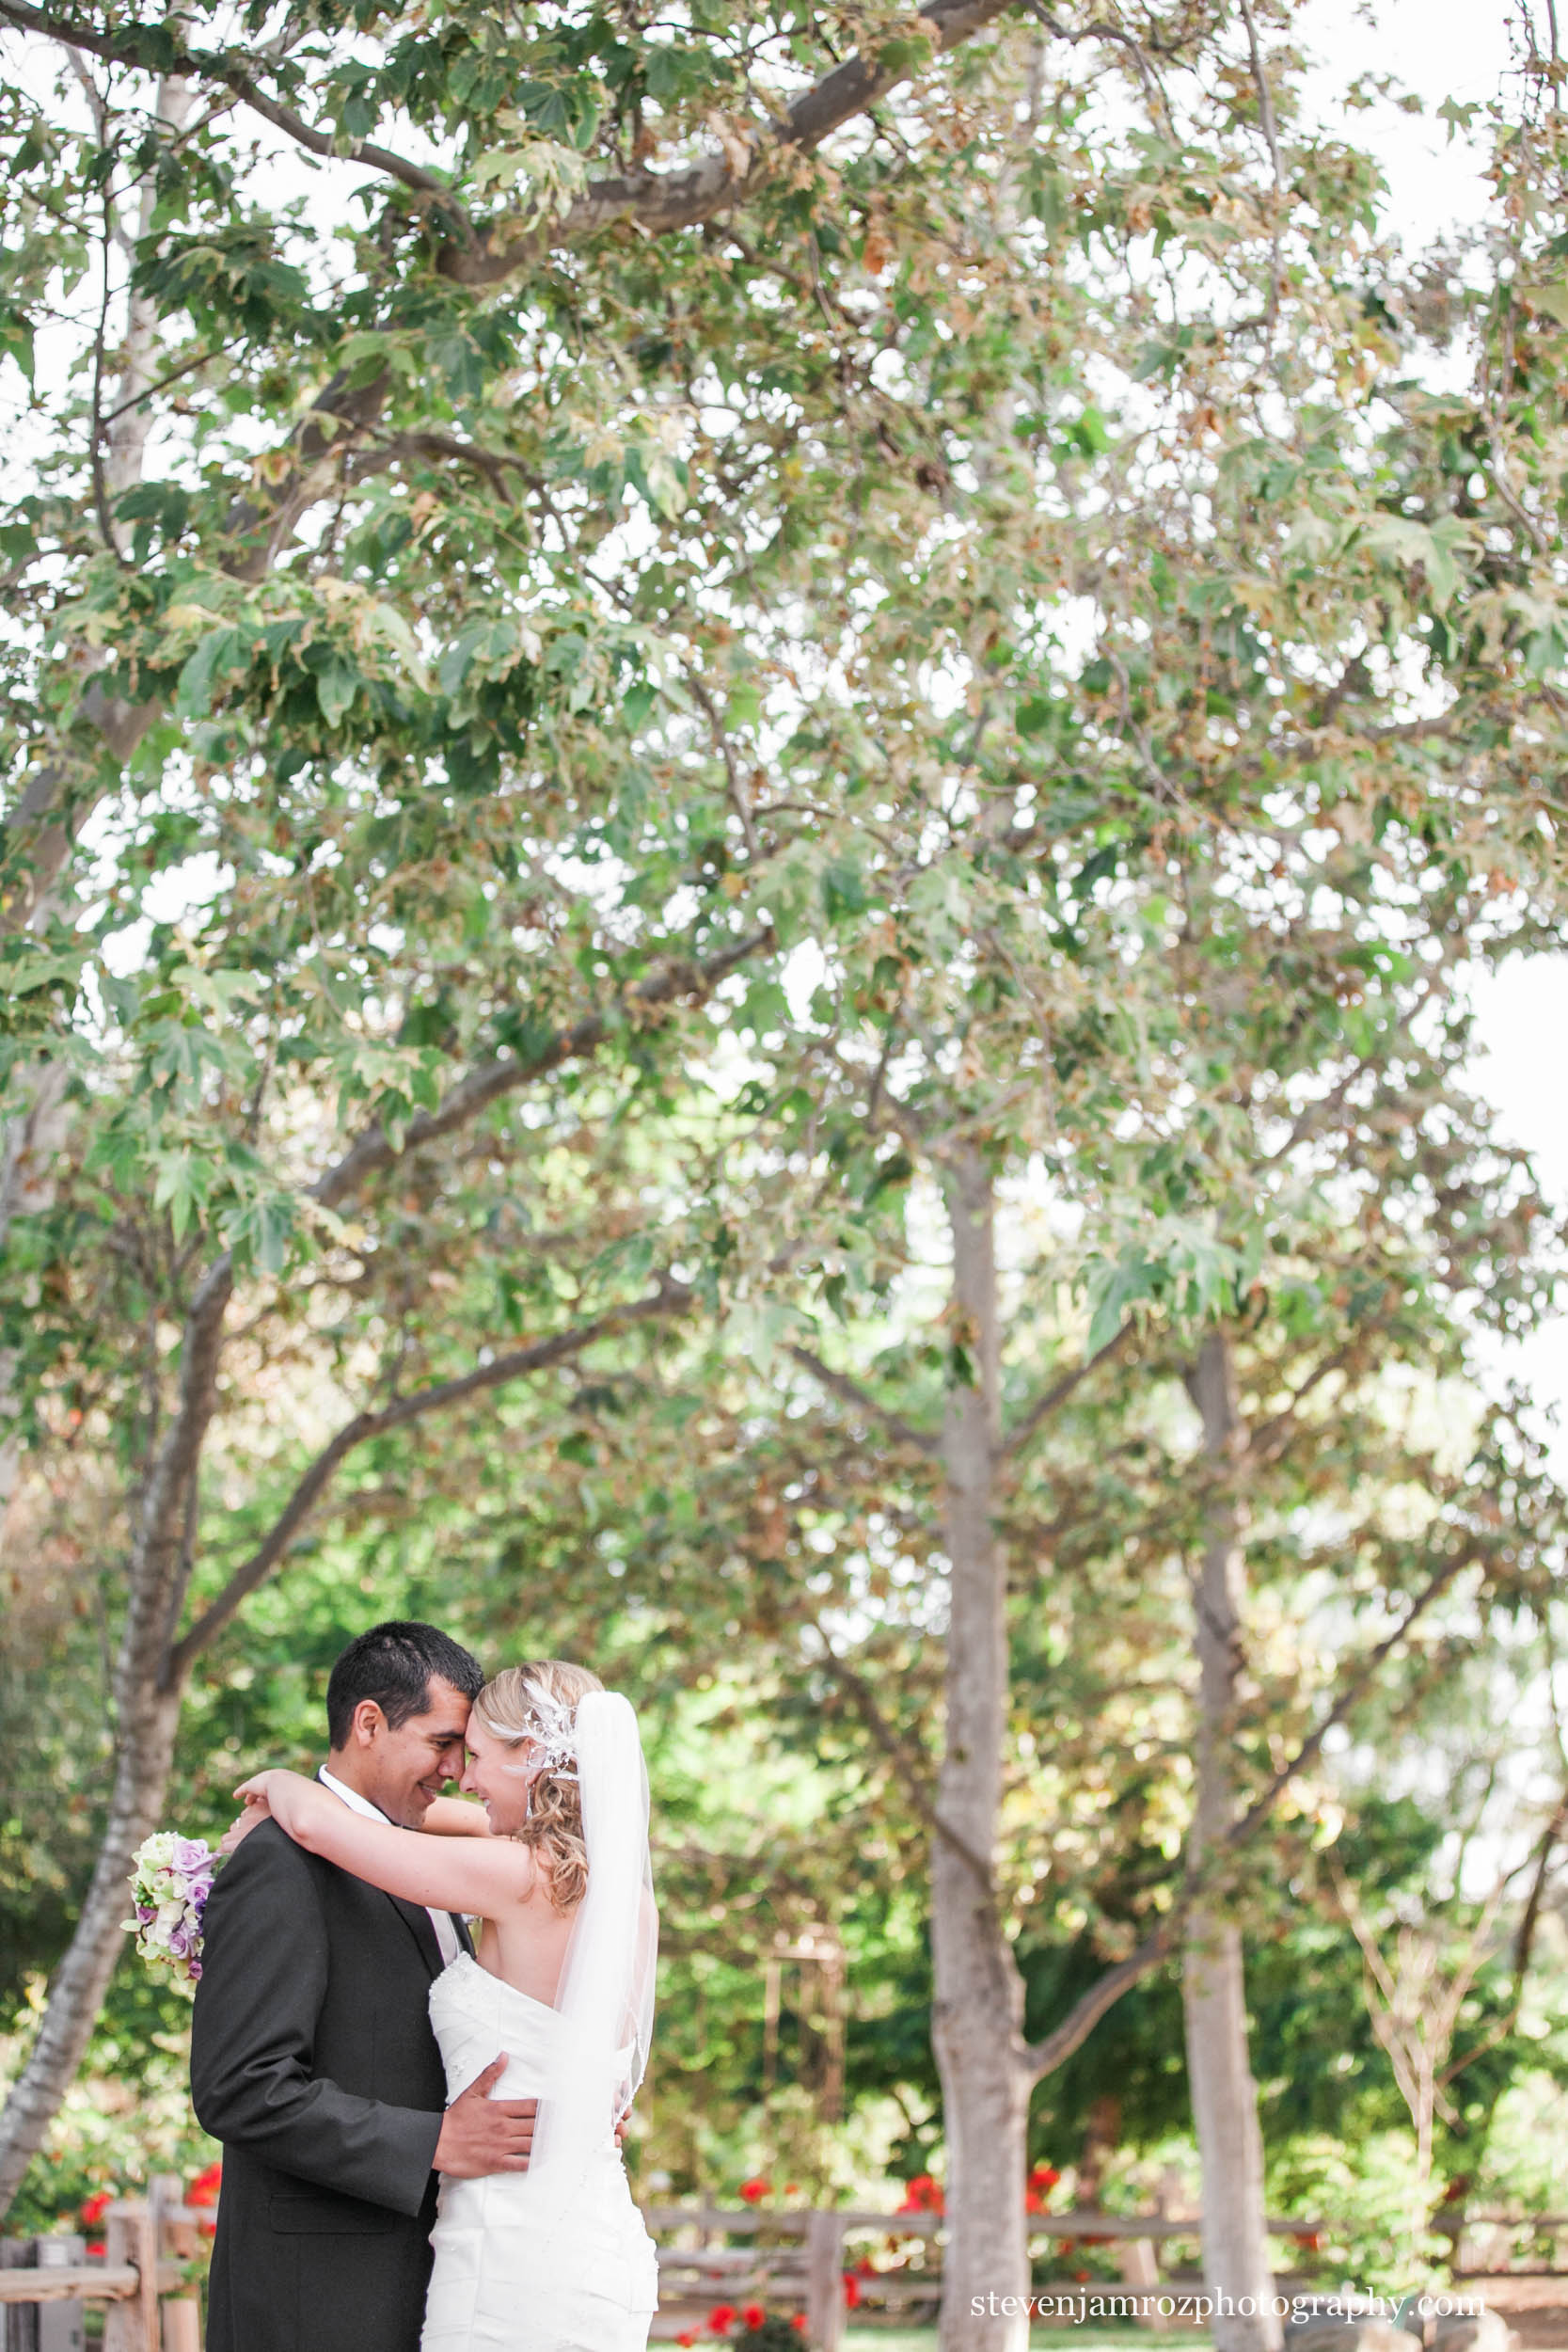 bride-groom-outdoor-portraits-durham-nc-wedding-steven-jamroz-photography-0446.jpg